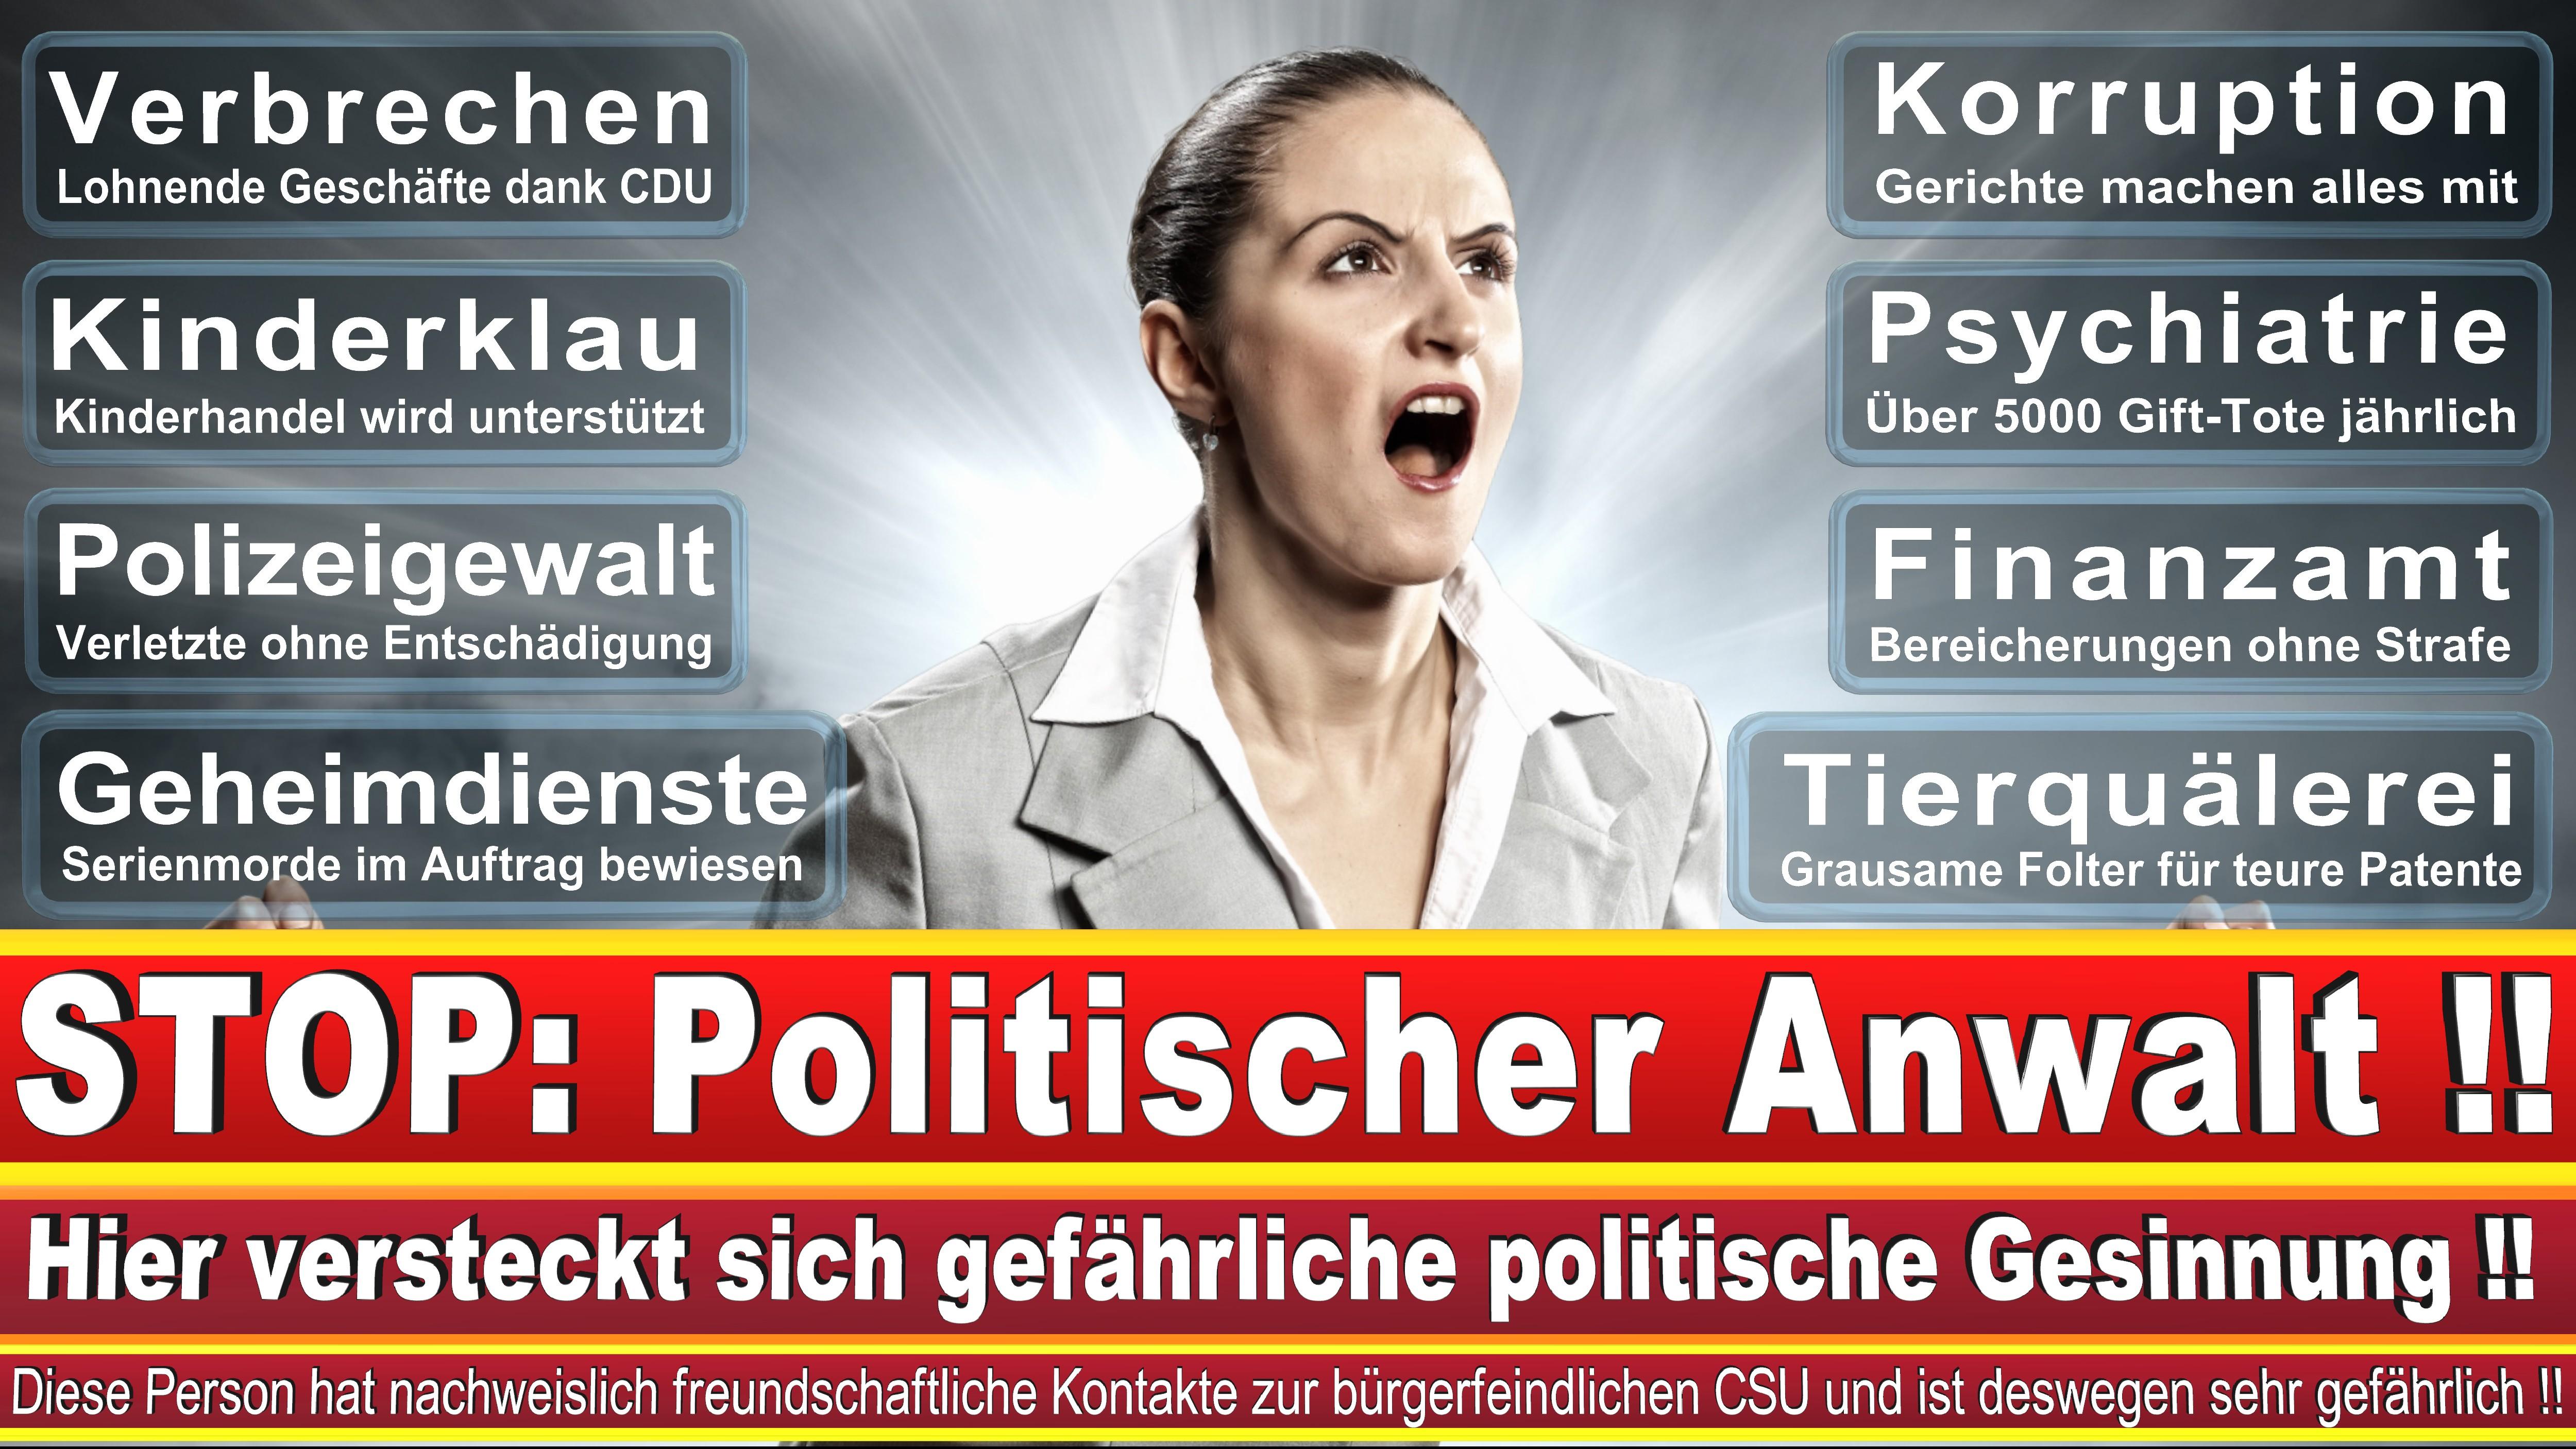 Rechtsanwalt Steffen Vogel Schweinfurt Selbstständig Rechtsanwalt Und Fachanwalt F Arbeitsrecht Rechtsanwaltskanzlei Blatt Kollegen